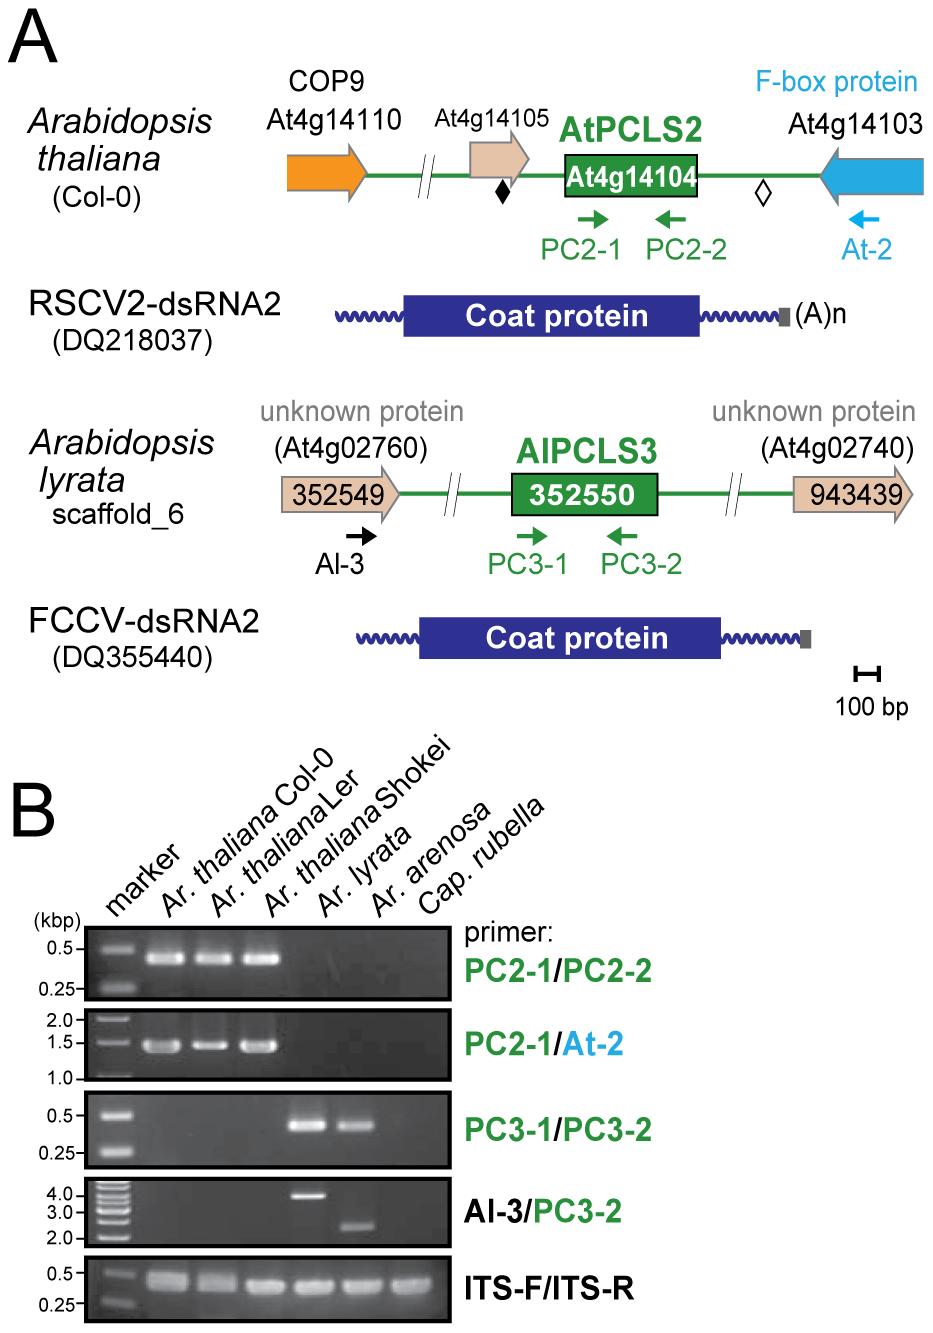 <i>PCLS2</i> and <i>PCLS3</i> homologs from members of the genus <i>Arabidopsis</i>.